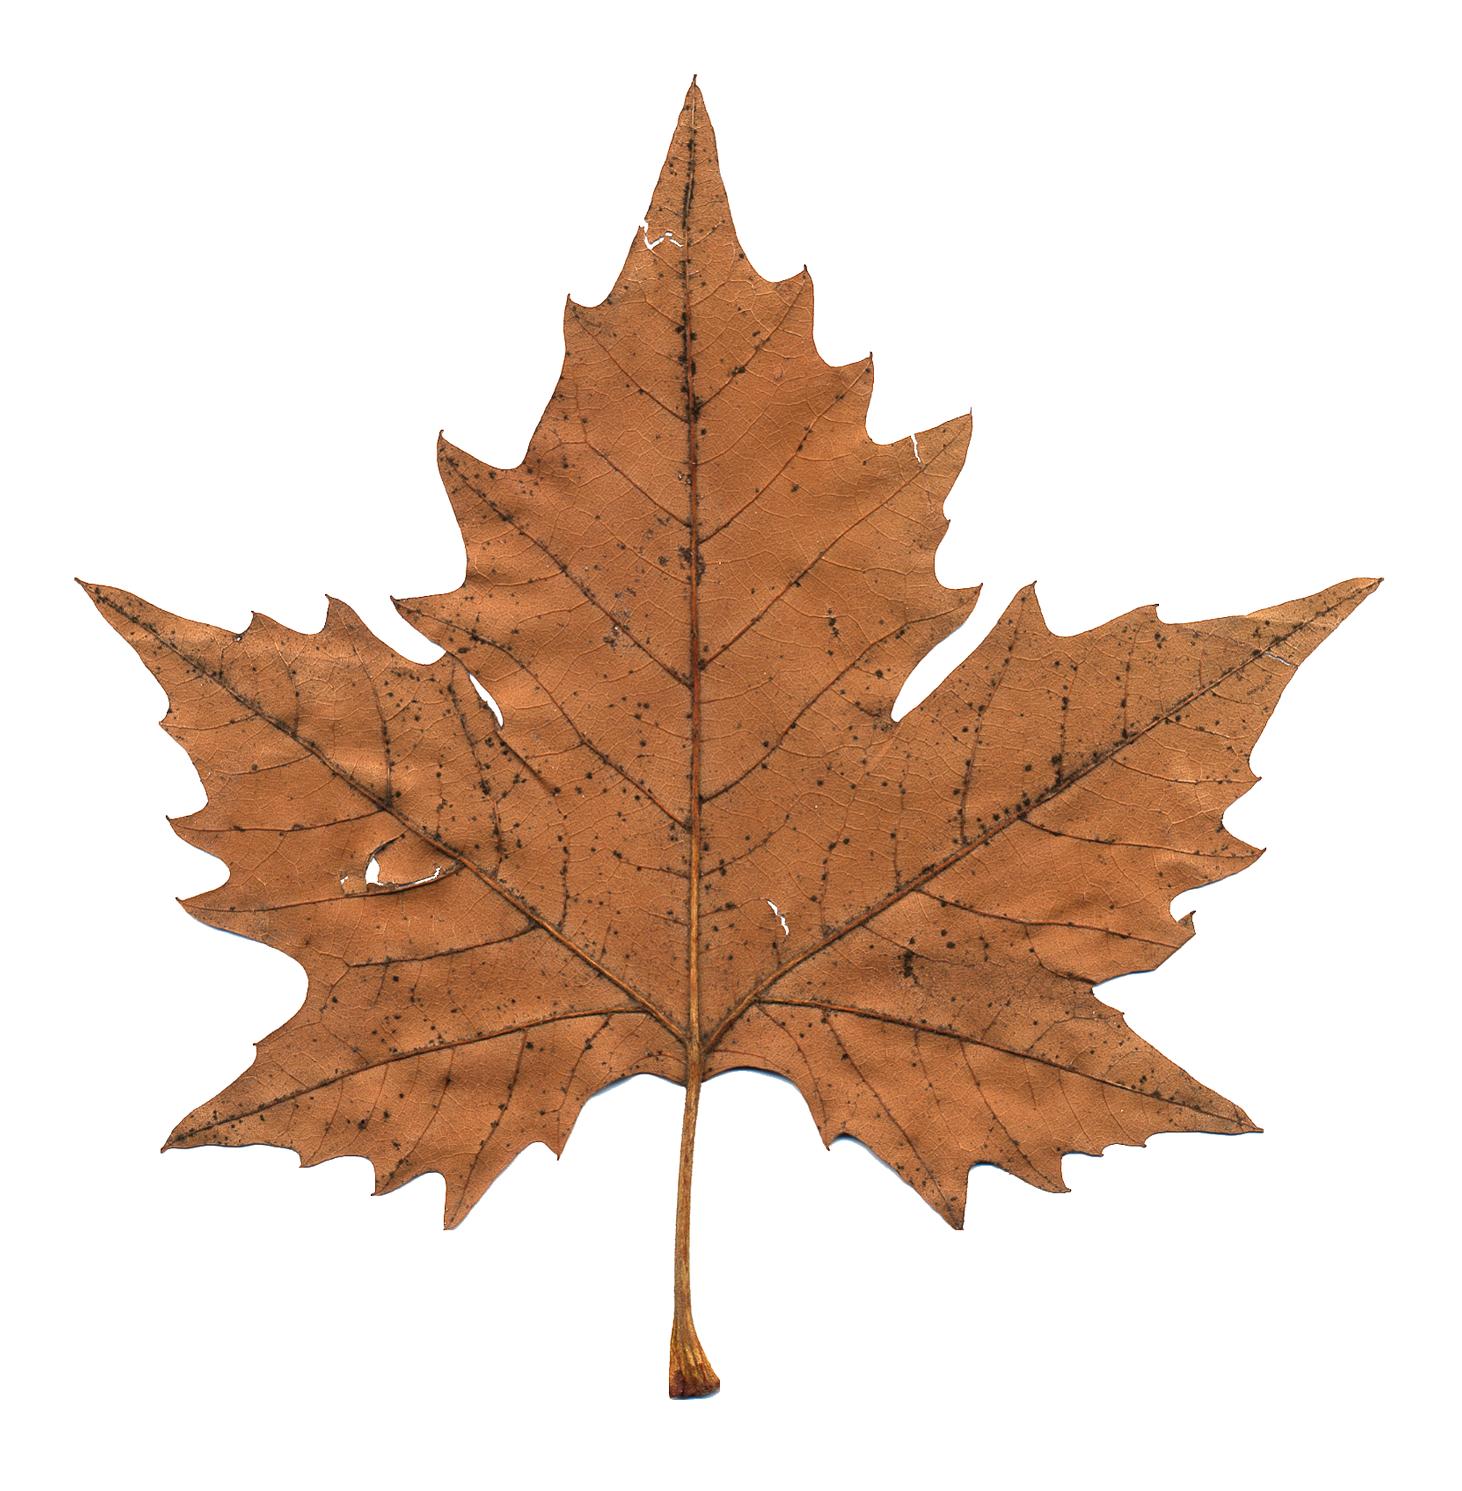 canadian maple leaf images - HD1462×1491